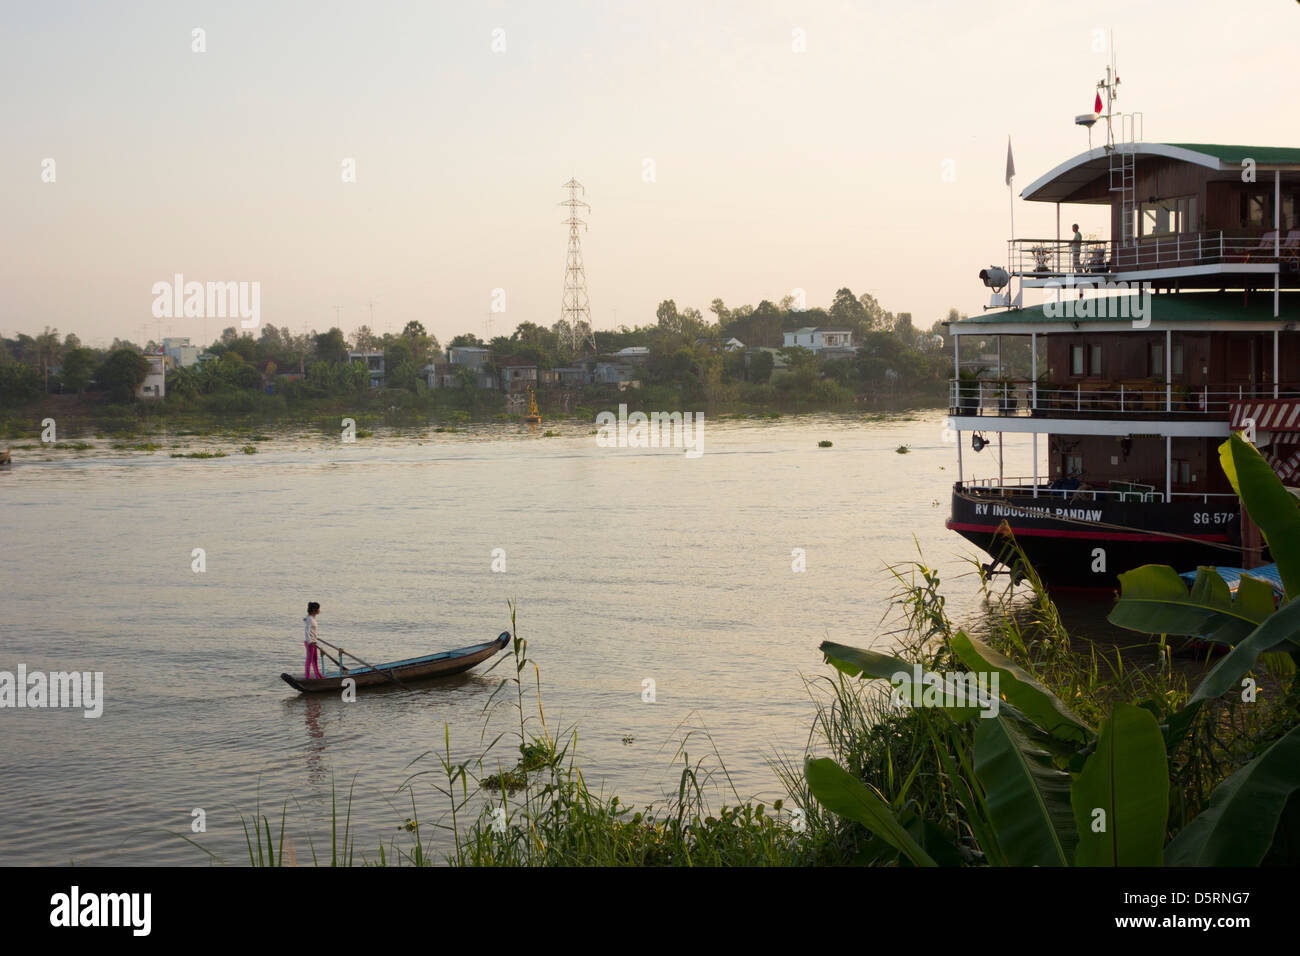 Bassac River stretch of the Mekhong; Chau Doc; Vietnam - Stock Image